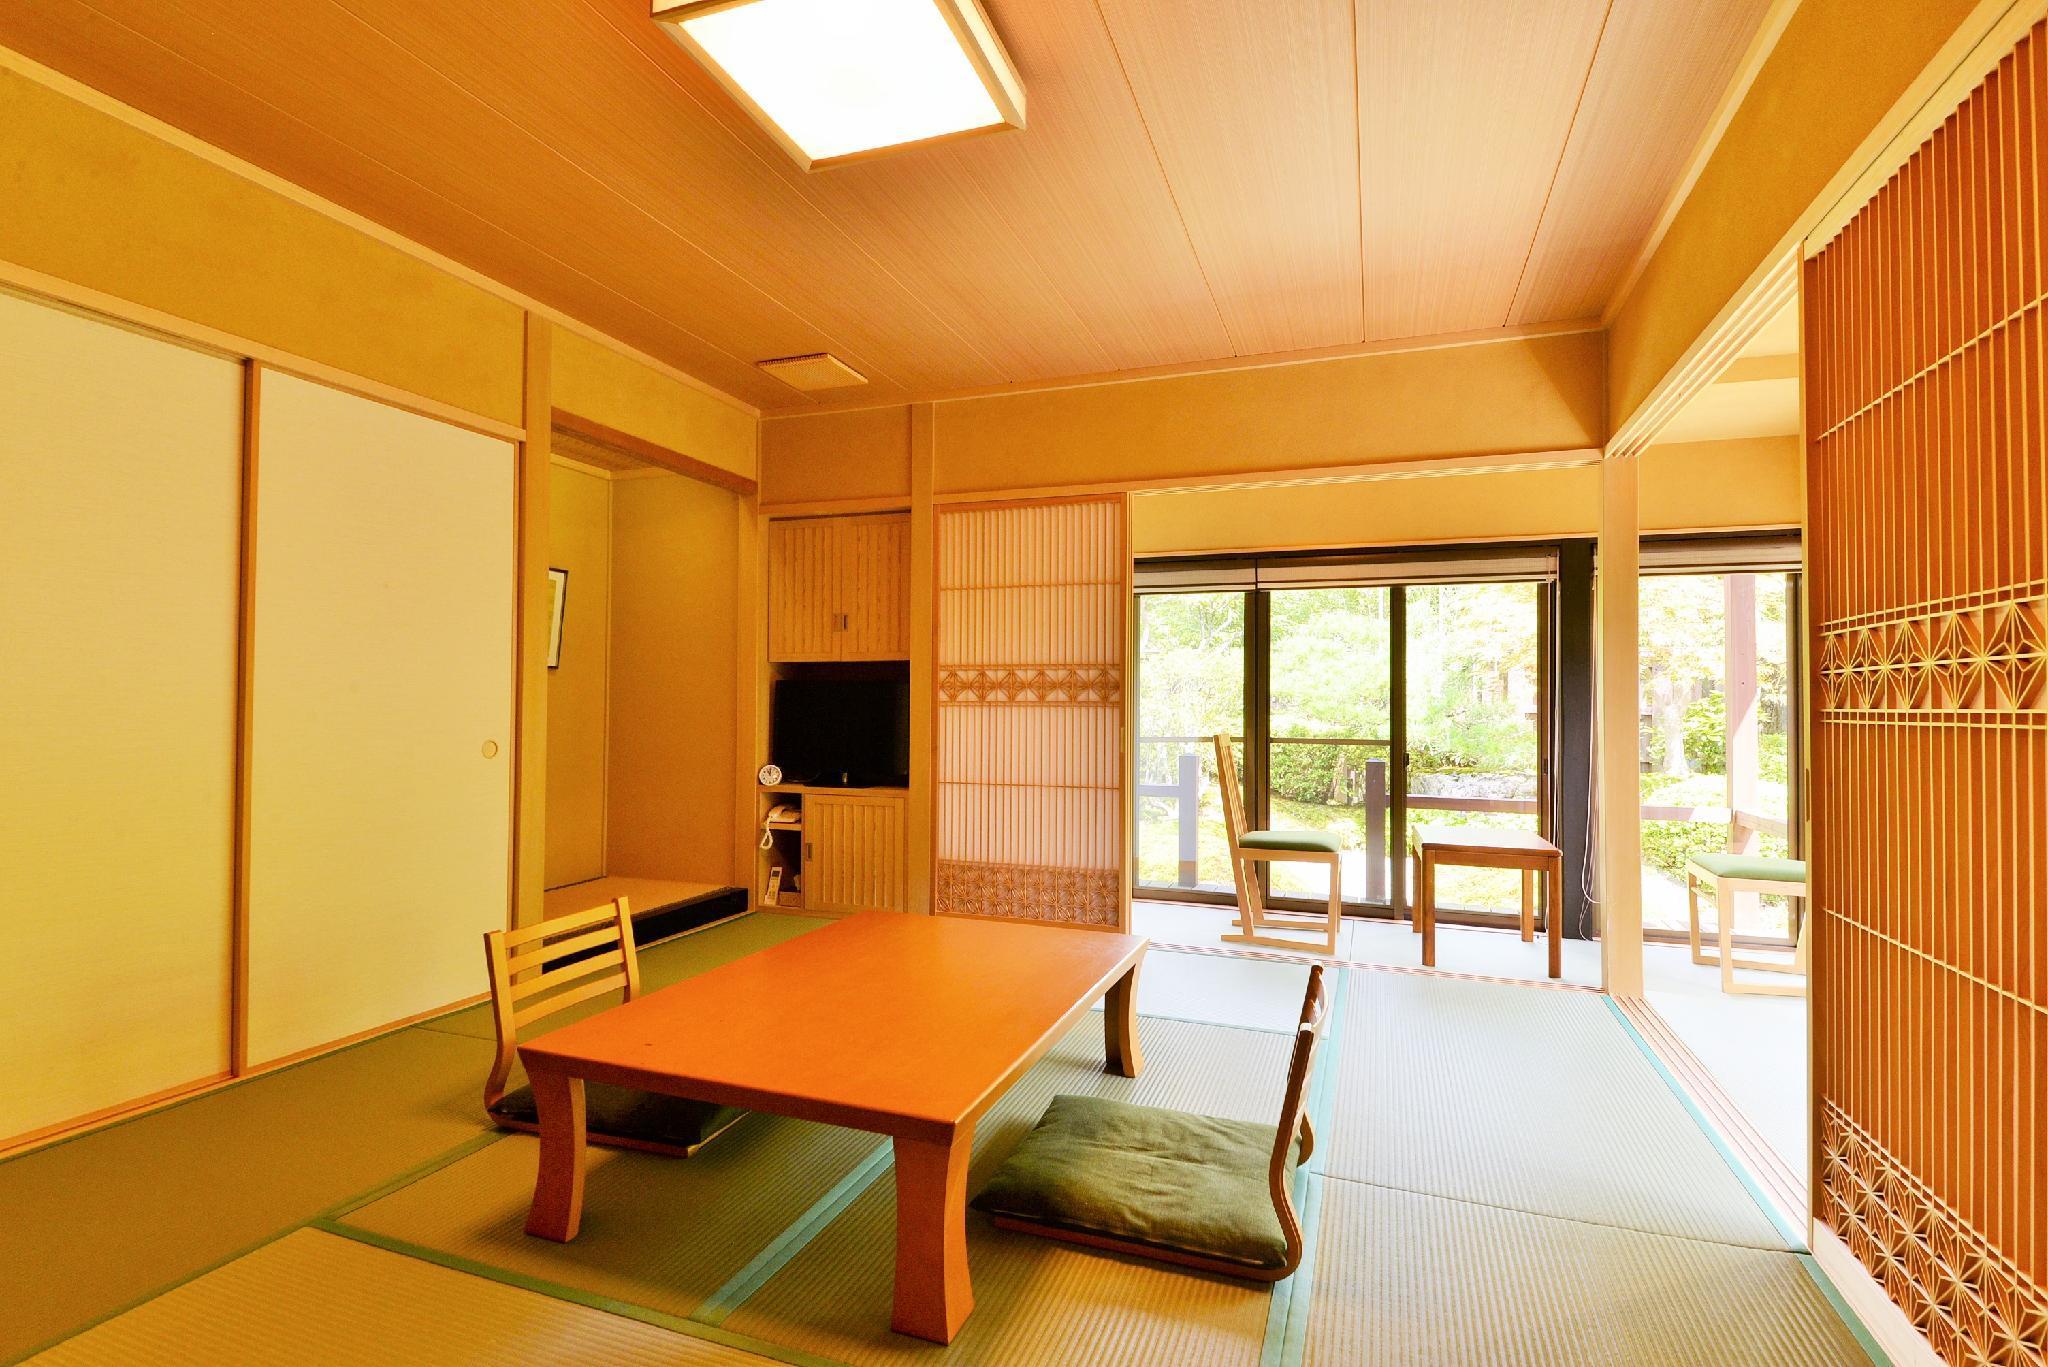 Ohara Onsen Hot Spring Source Restaurant and Ryokan SERYO